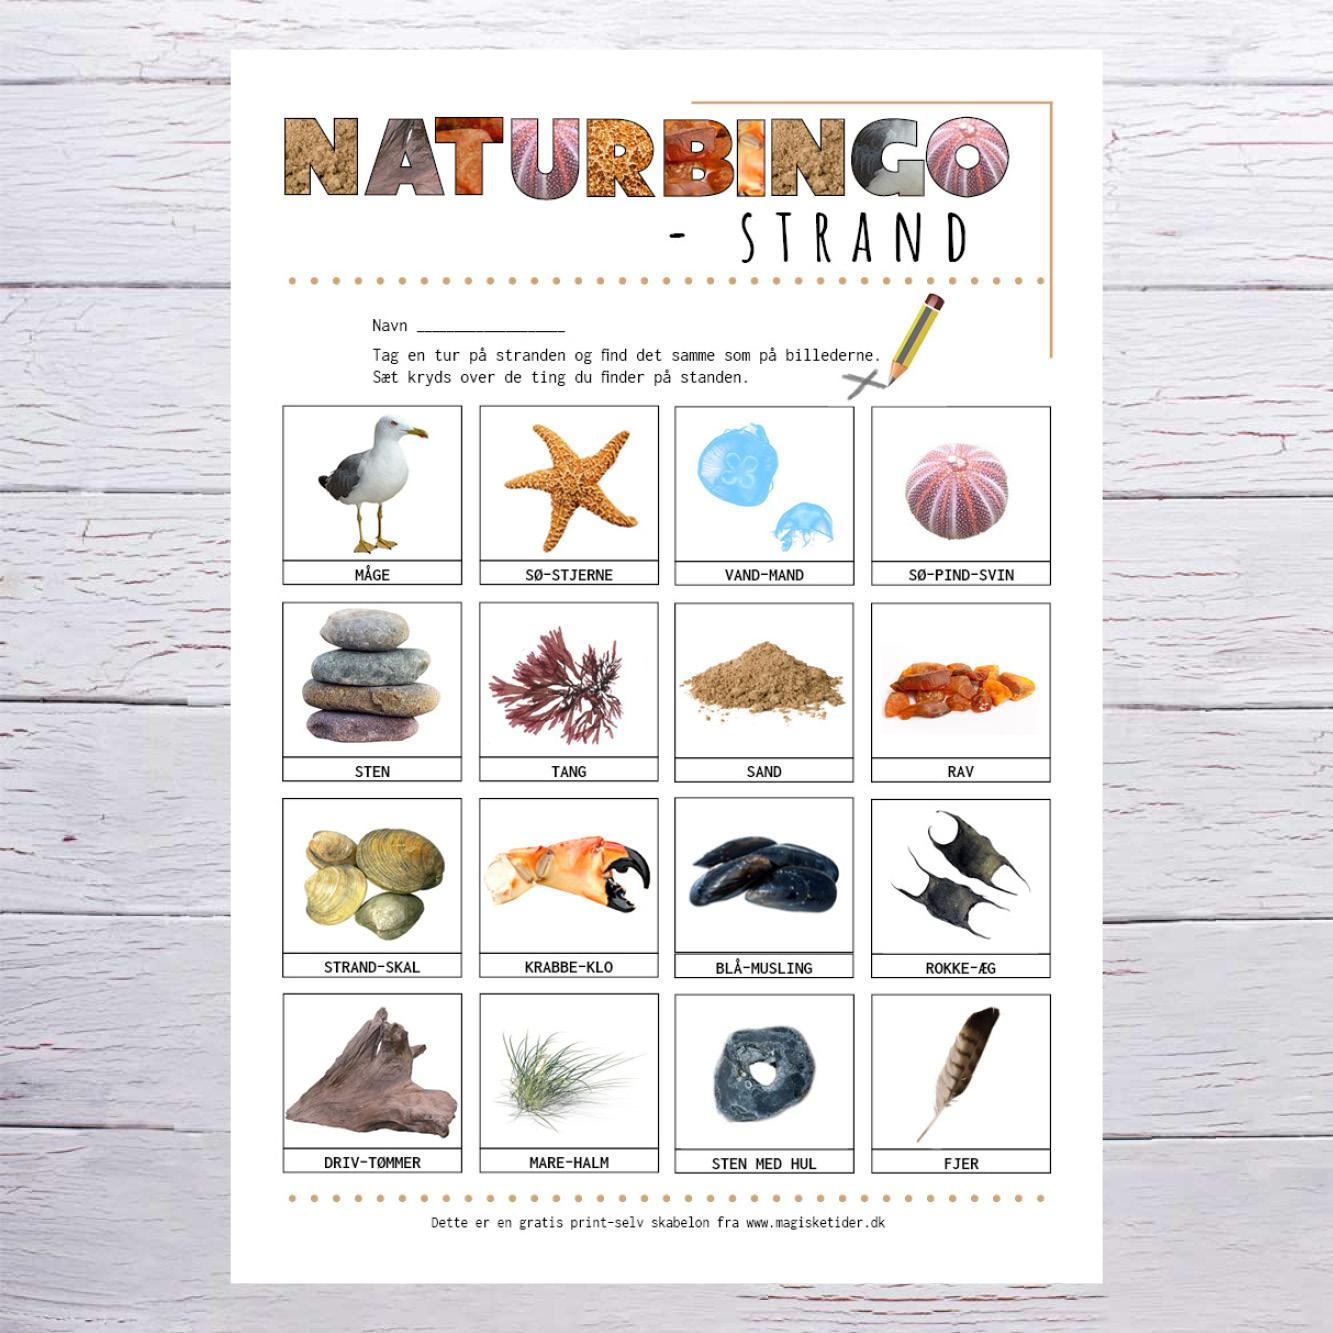 Naturbingo - strand